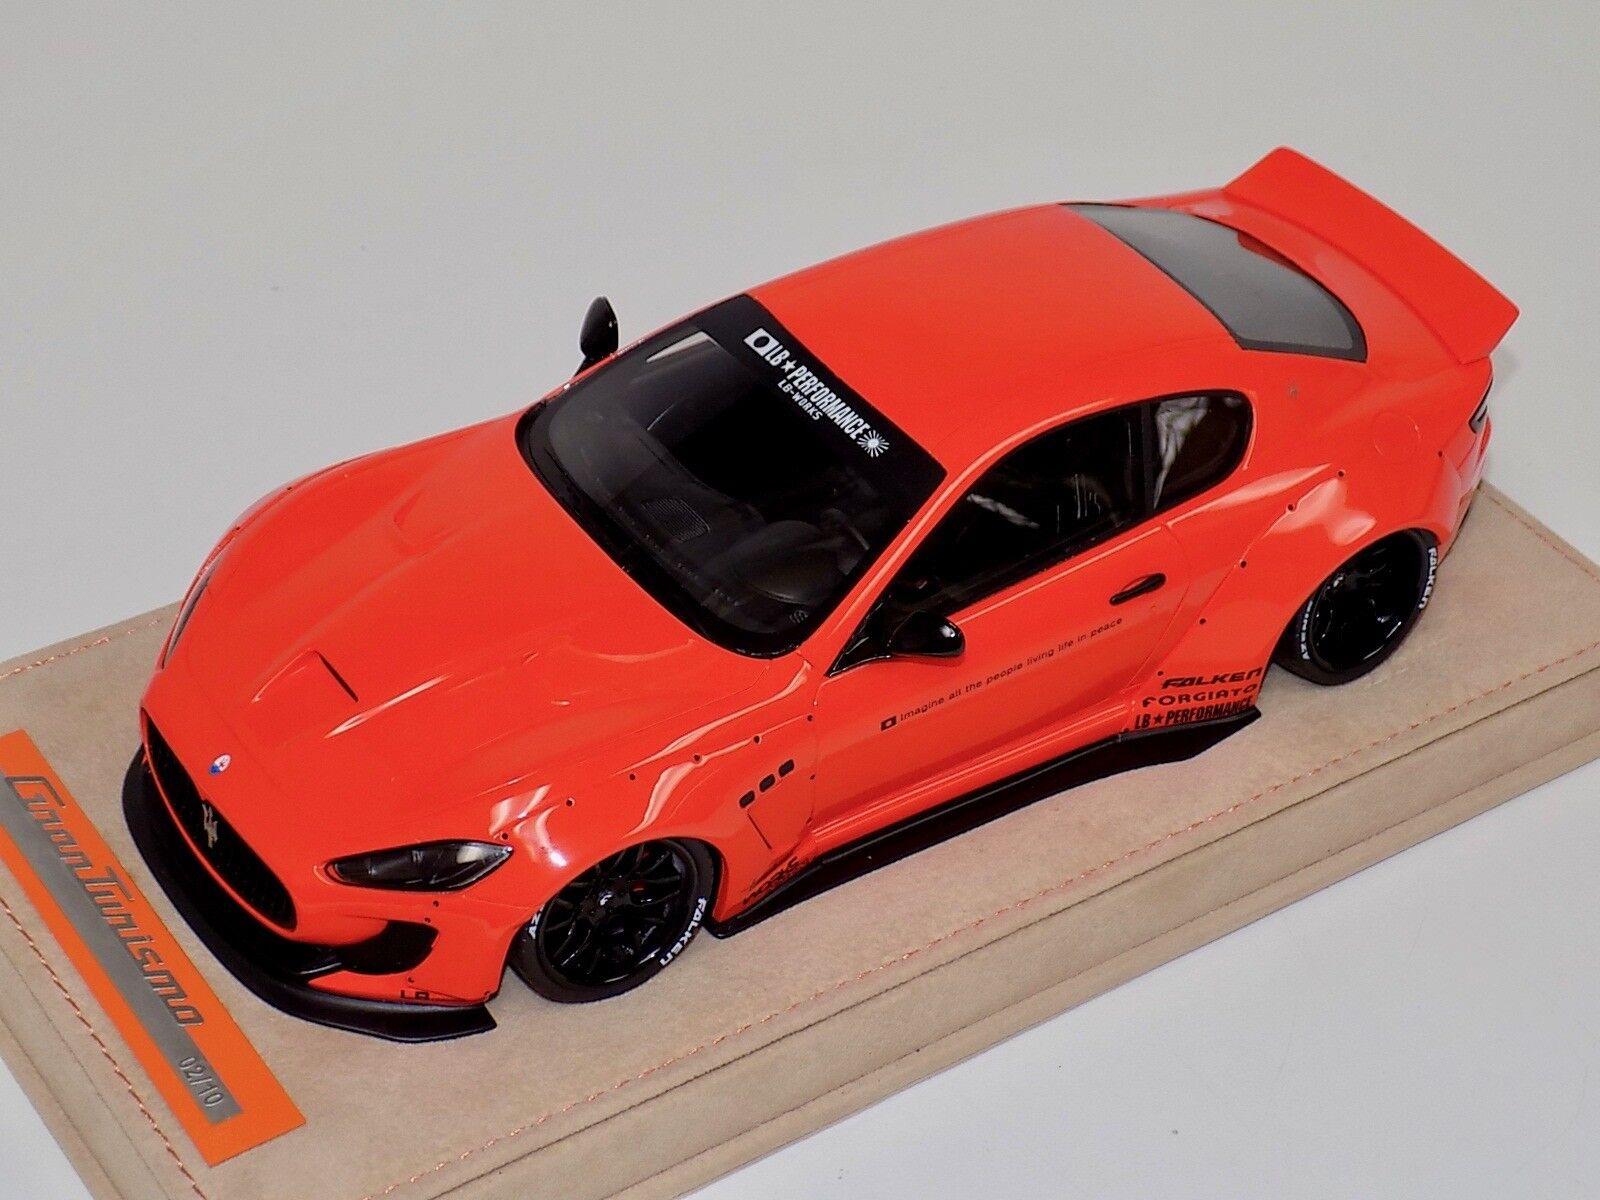 Modelos Maserati GranTurismo Liberty AB caminar Brillo Naranja Alcantara